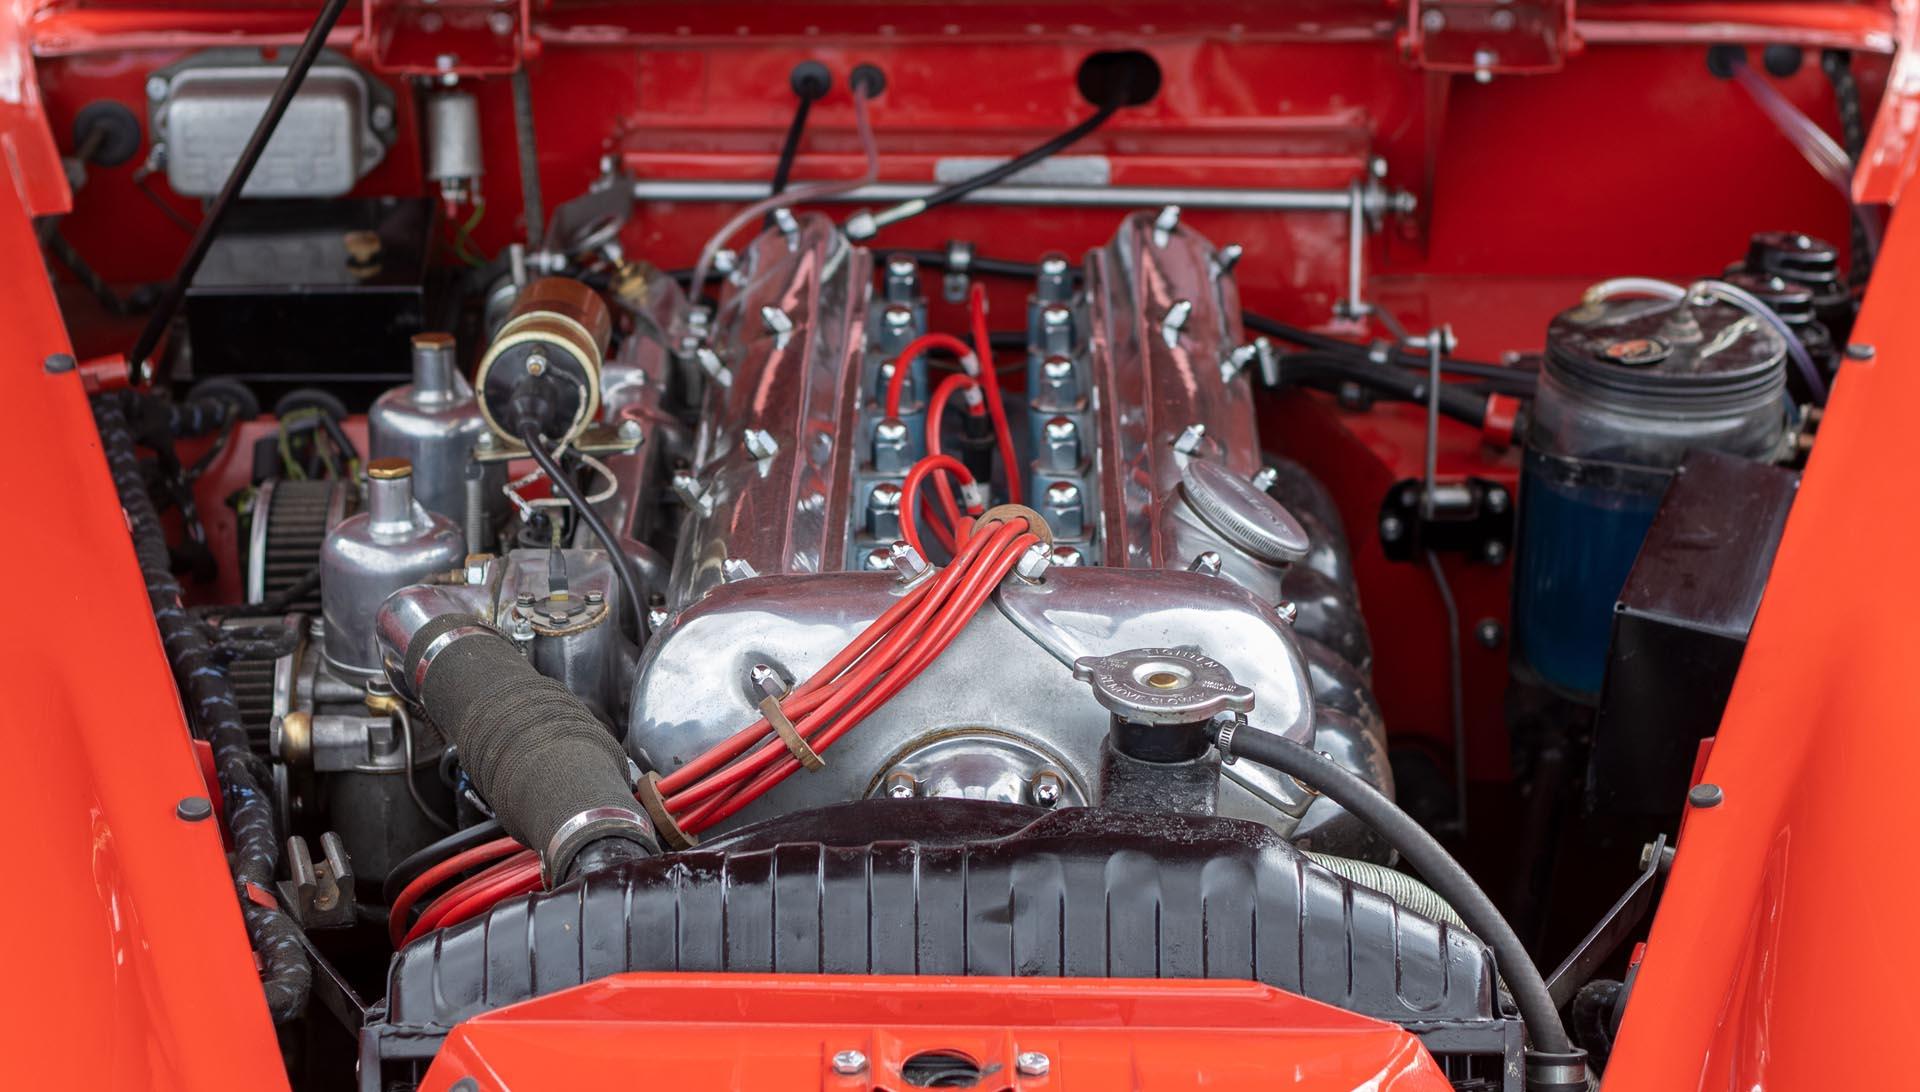 1958 Jaguar XK150 SE OTS for sale at The Classic Motor Hub